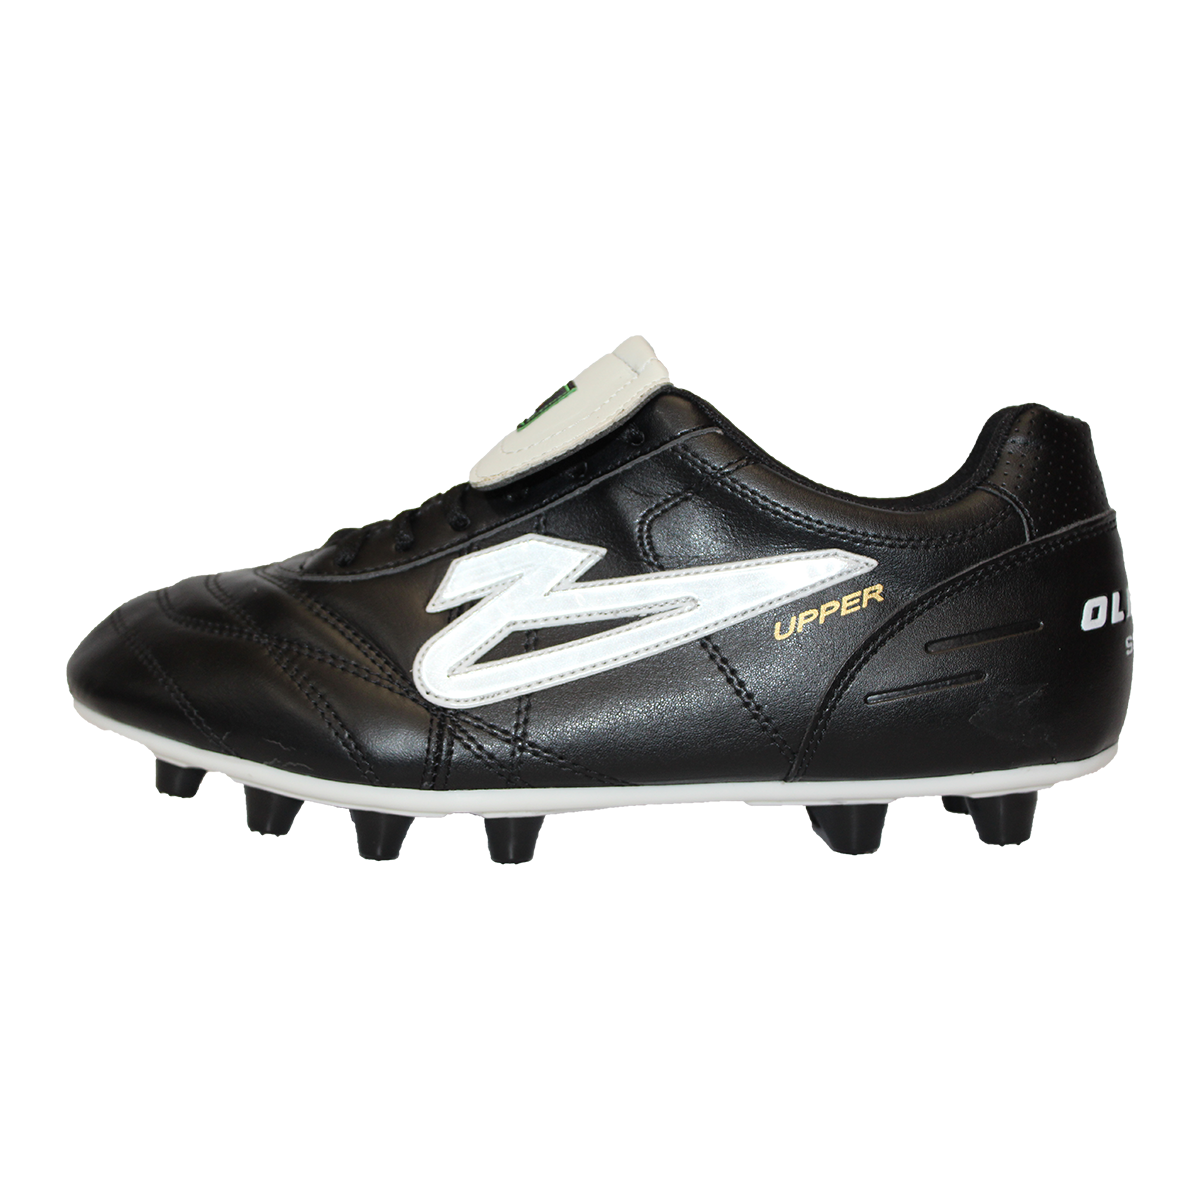 new product 1b8d0 ec707 Zapatos de Futbol Olmeca - OlmecaSport